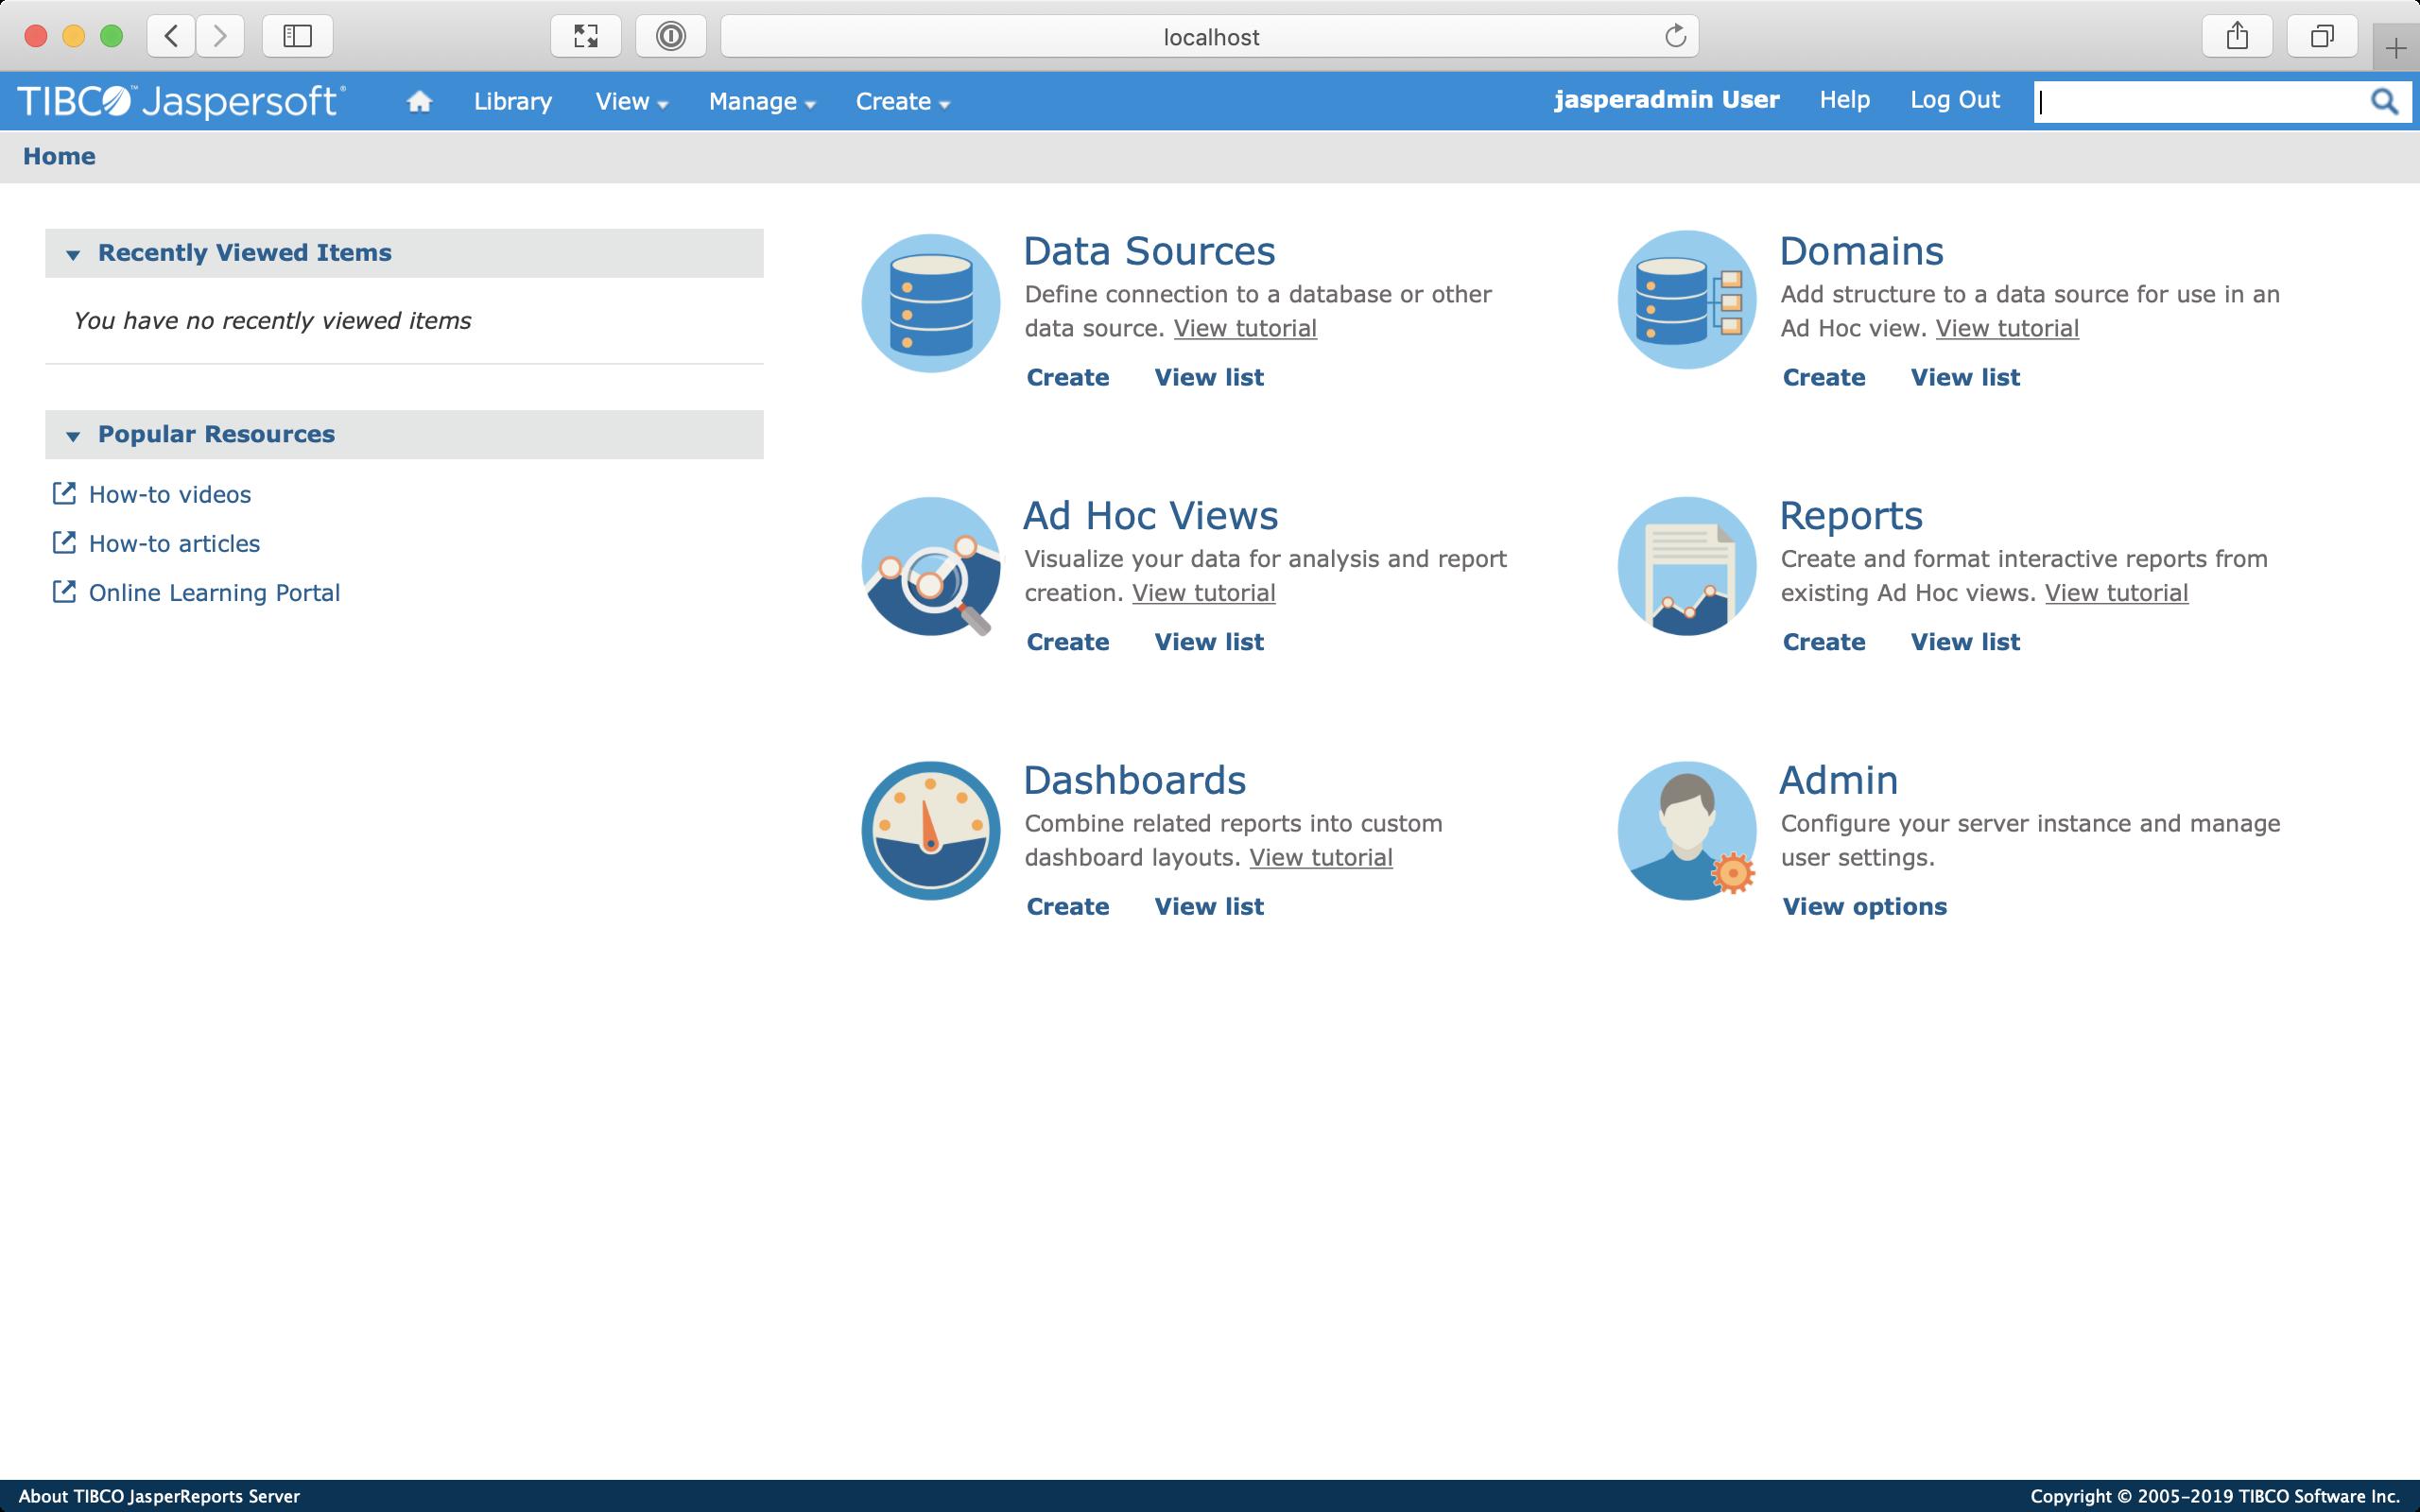 Screenshot of the home screen